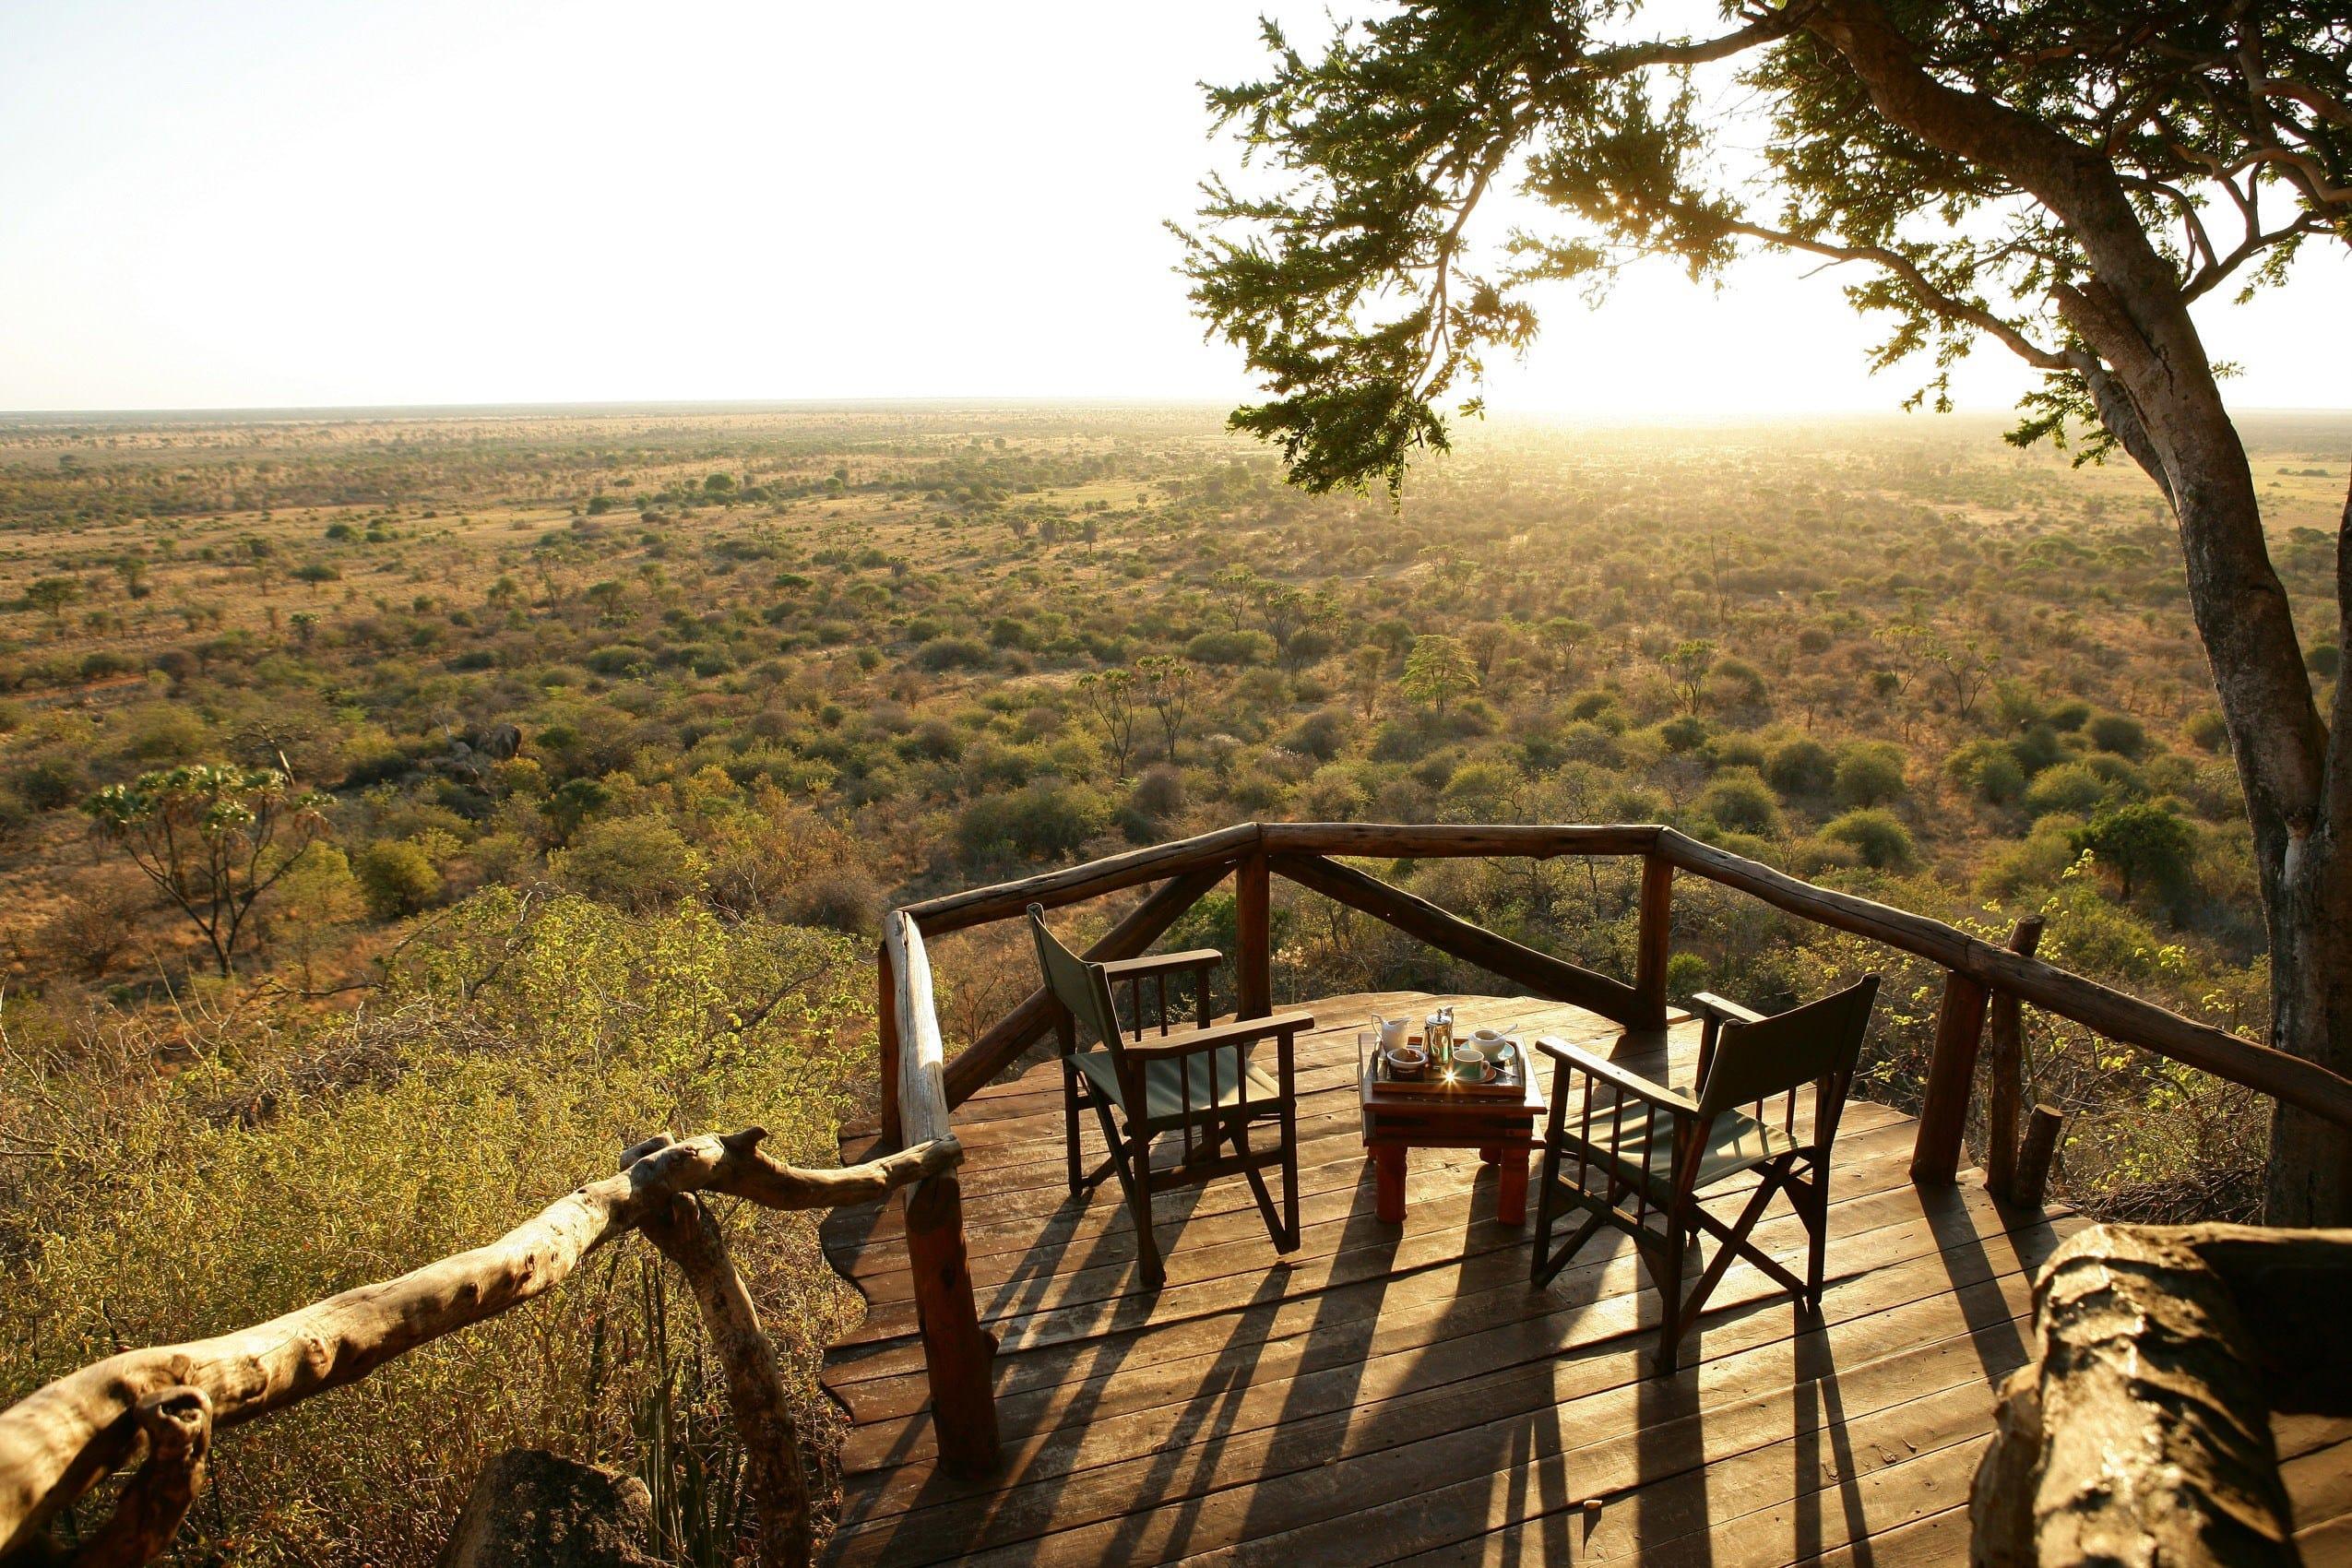 Meru National Park Kenya Safari Tours Accommodations